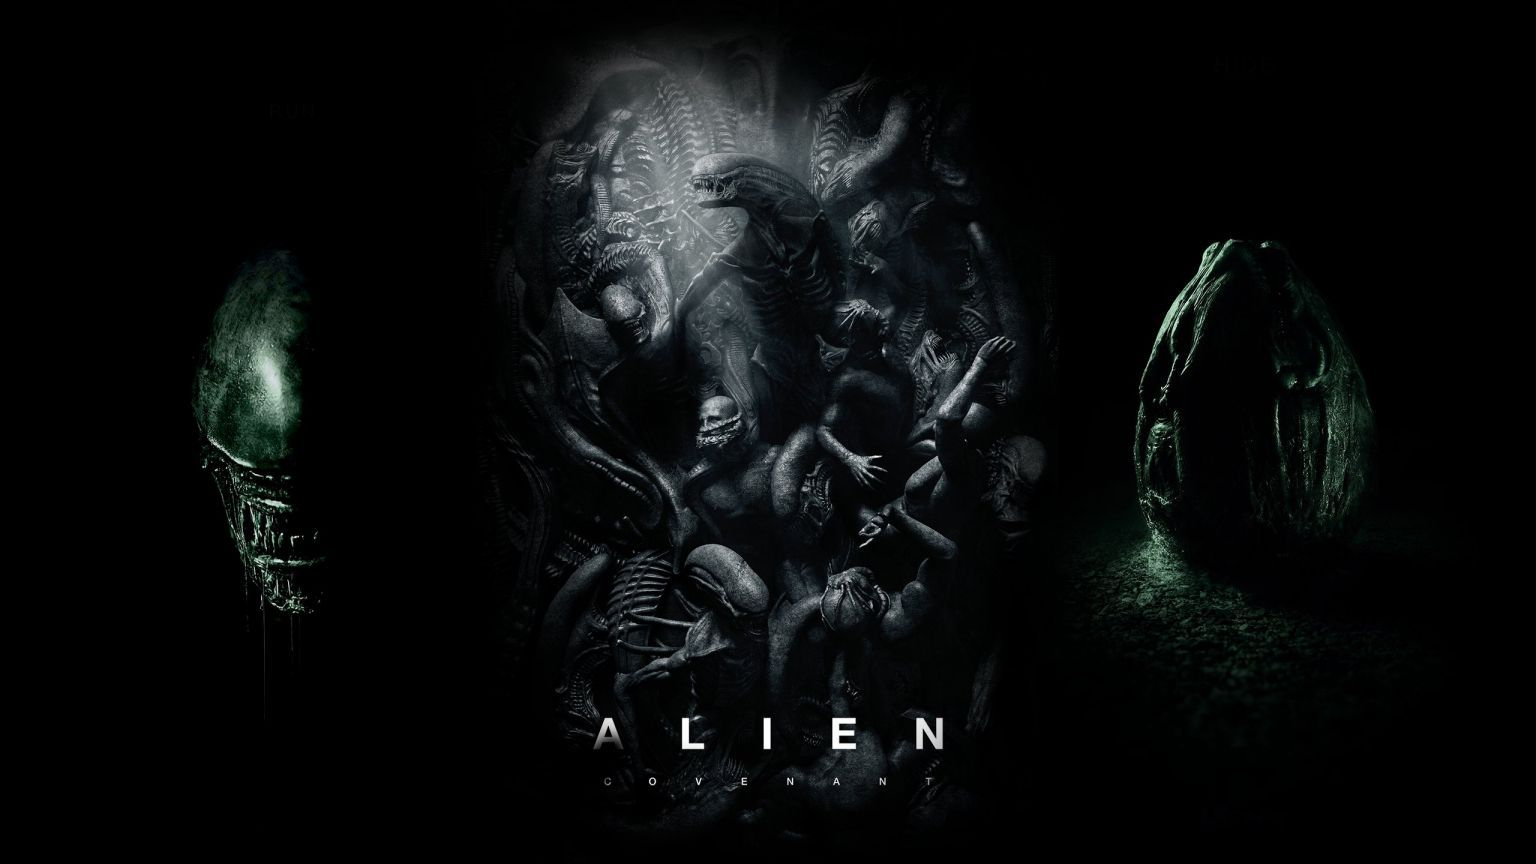 Alien Covenant wallpaper in 1536x864 resolution 1536x864